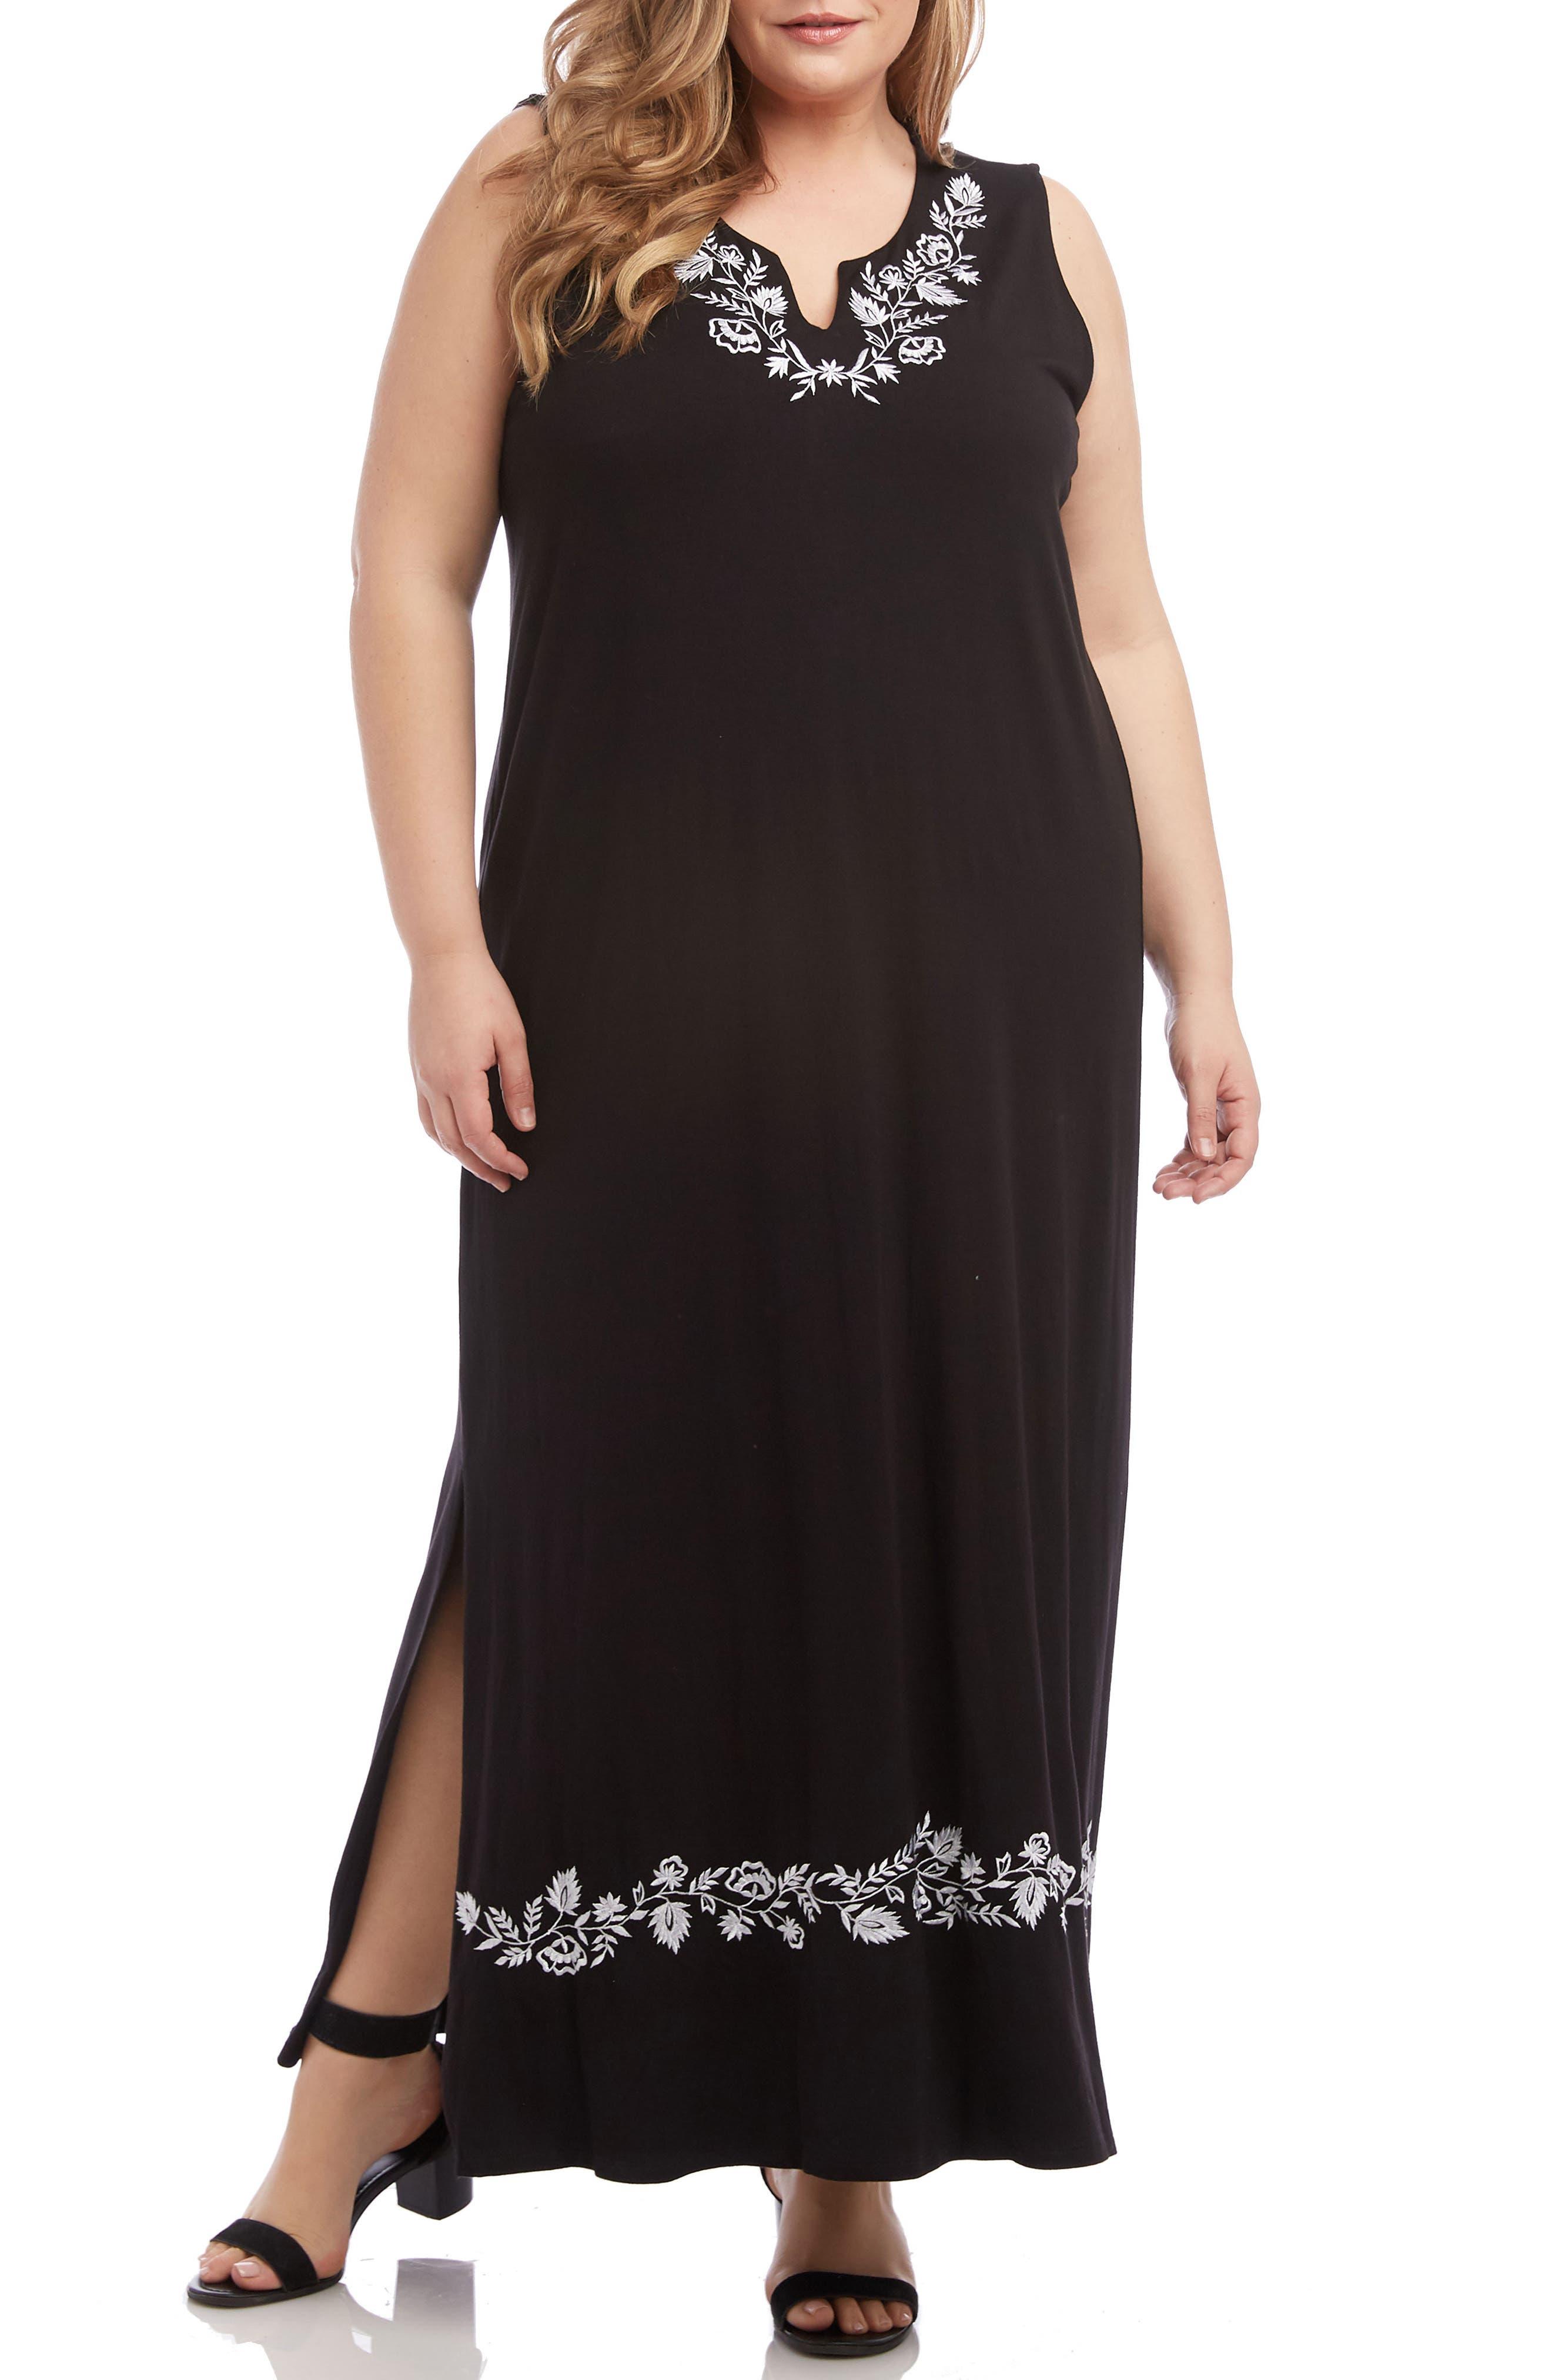 KAREN KANE, Embroidered Maxi Dress, Main thumbnail 1, color, BLACK